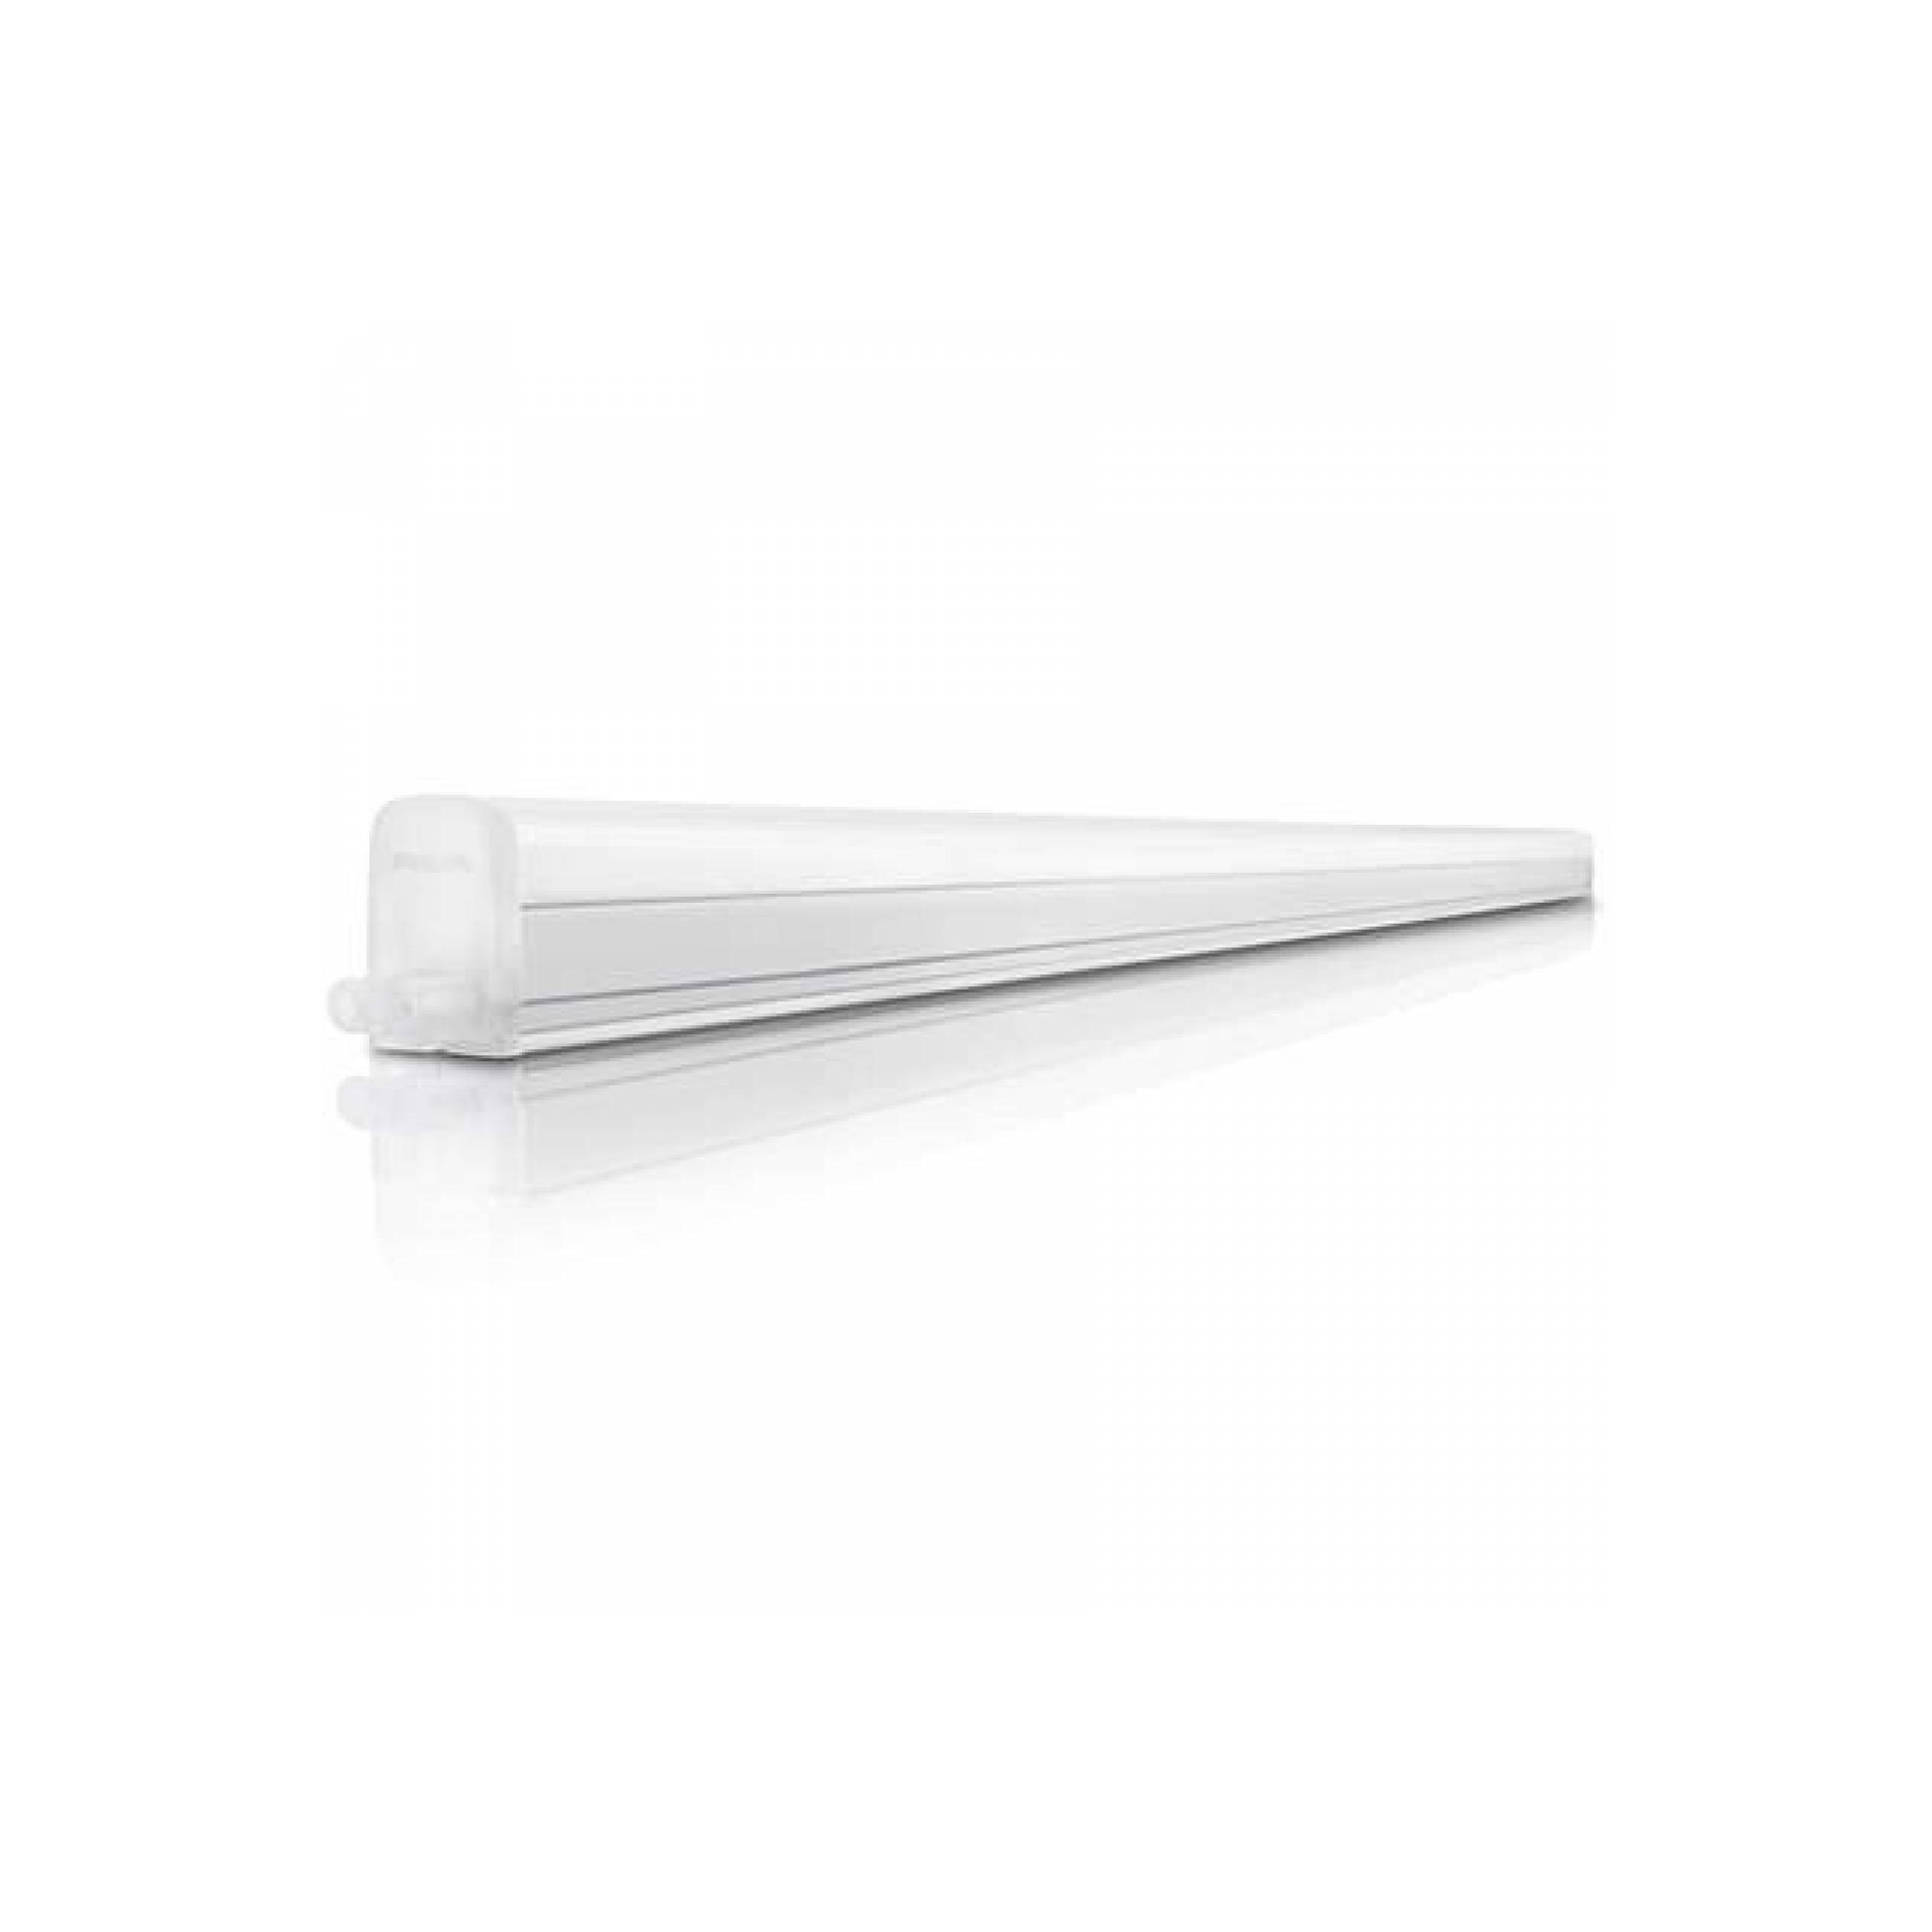 Lampu T5 Drop Ceiling/Cove Light LED Trunklinea Philips 31095 4000K